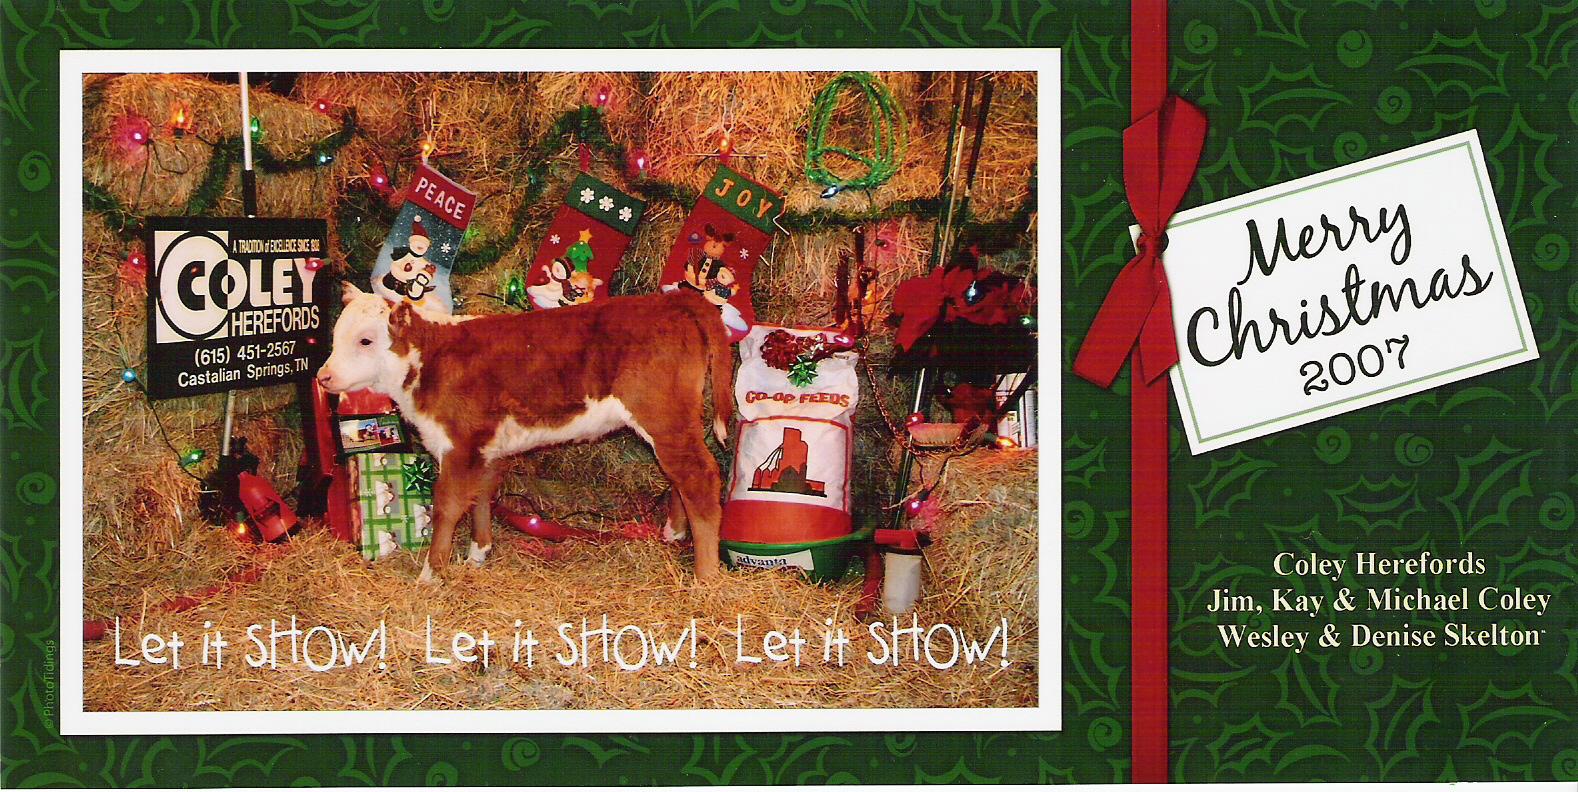 Coley Christmas card 2007